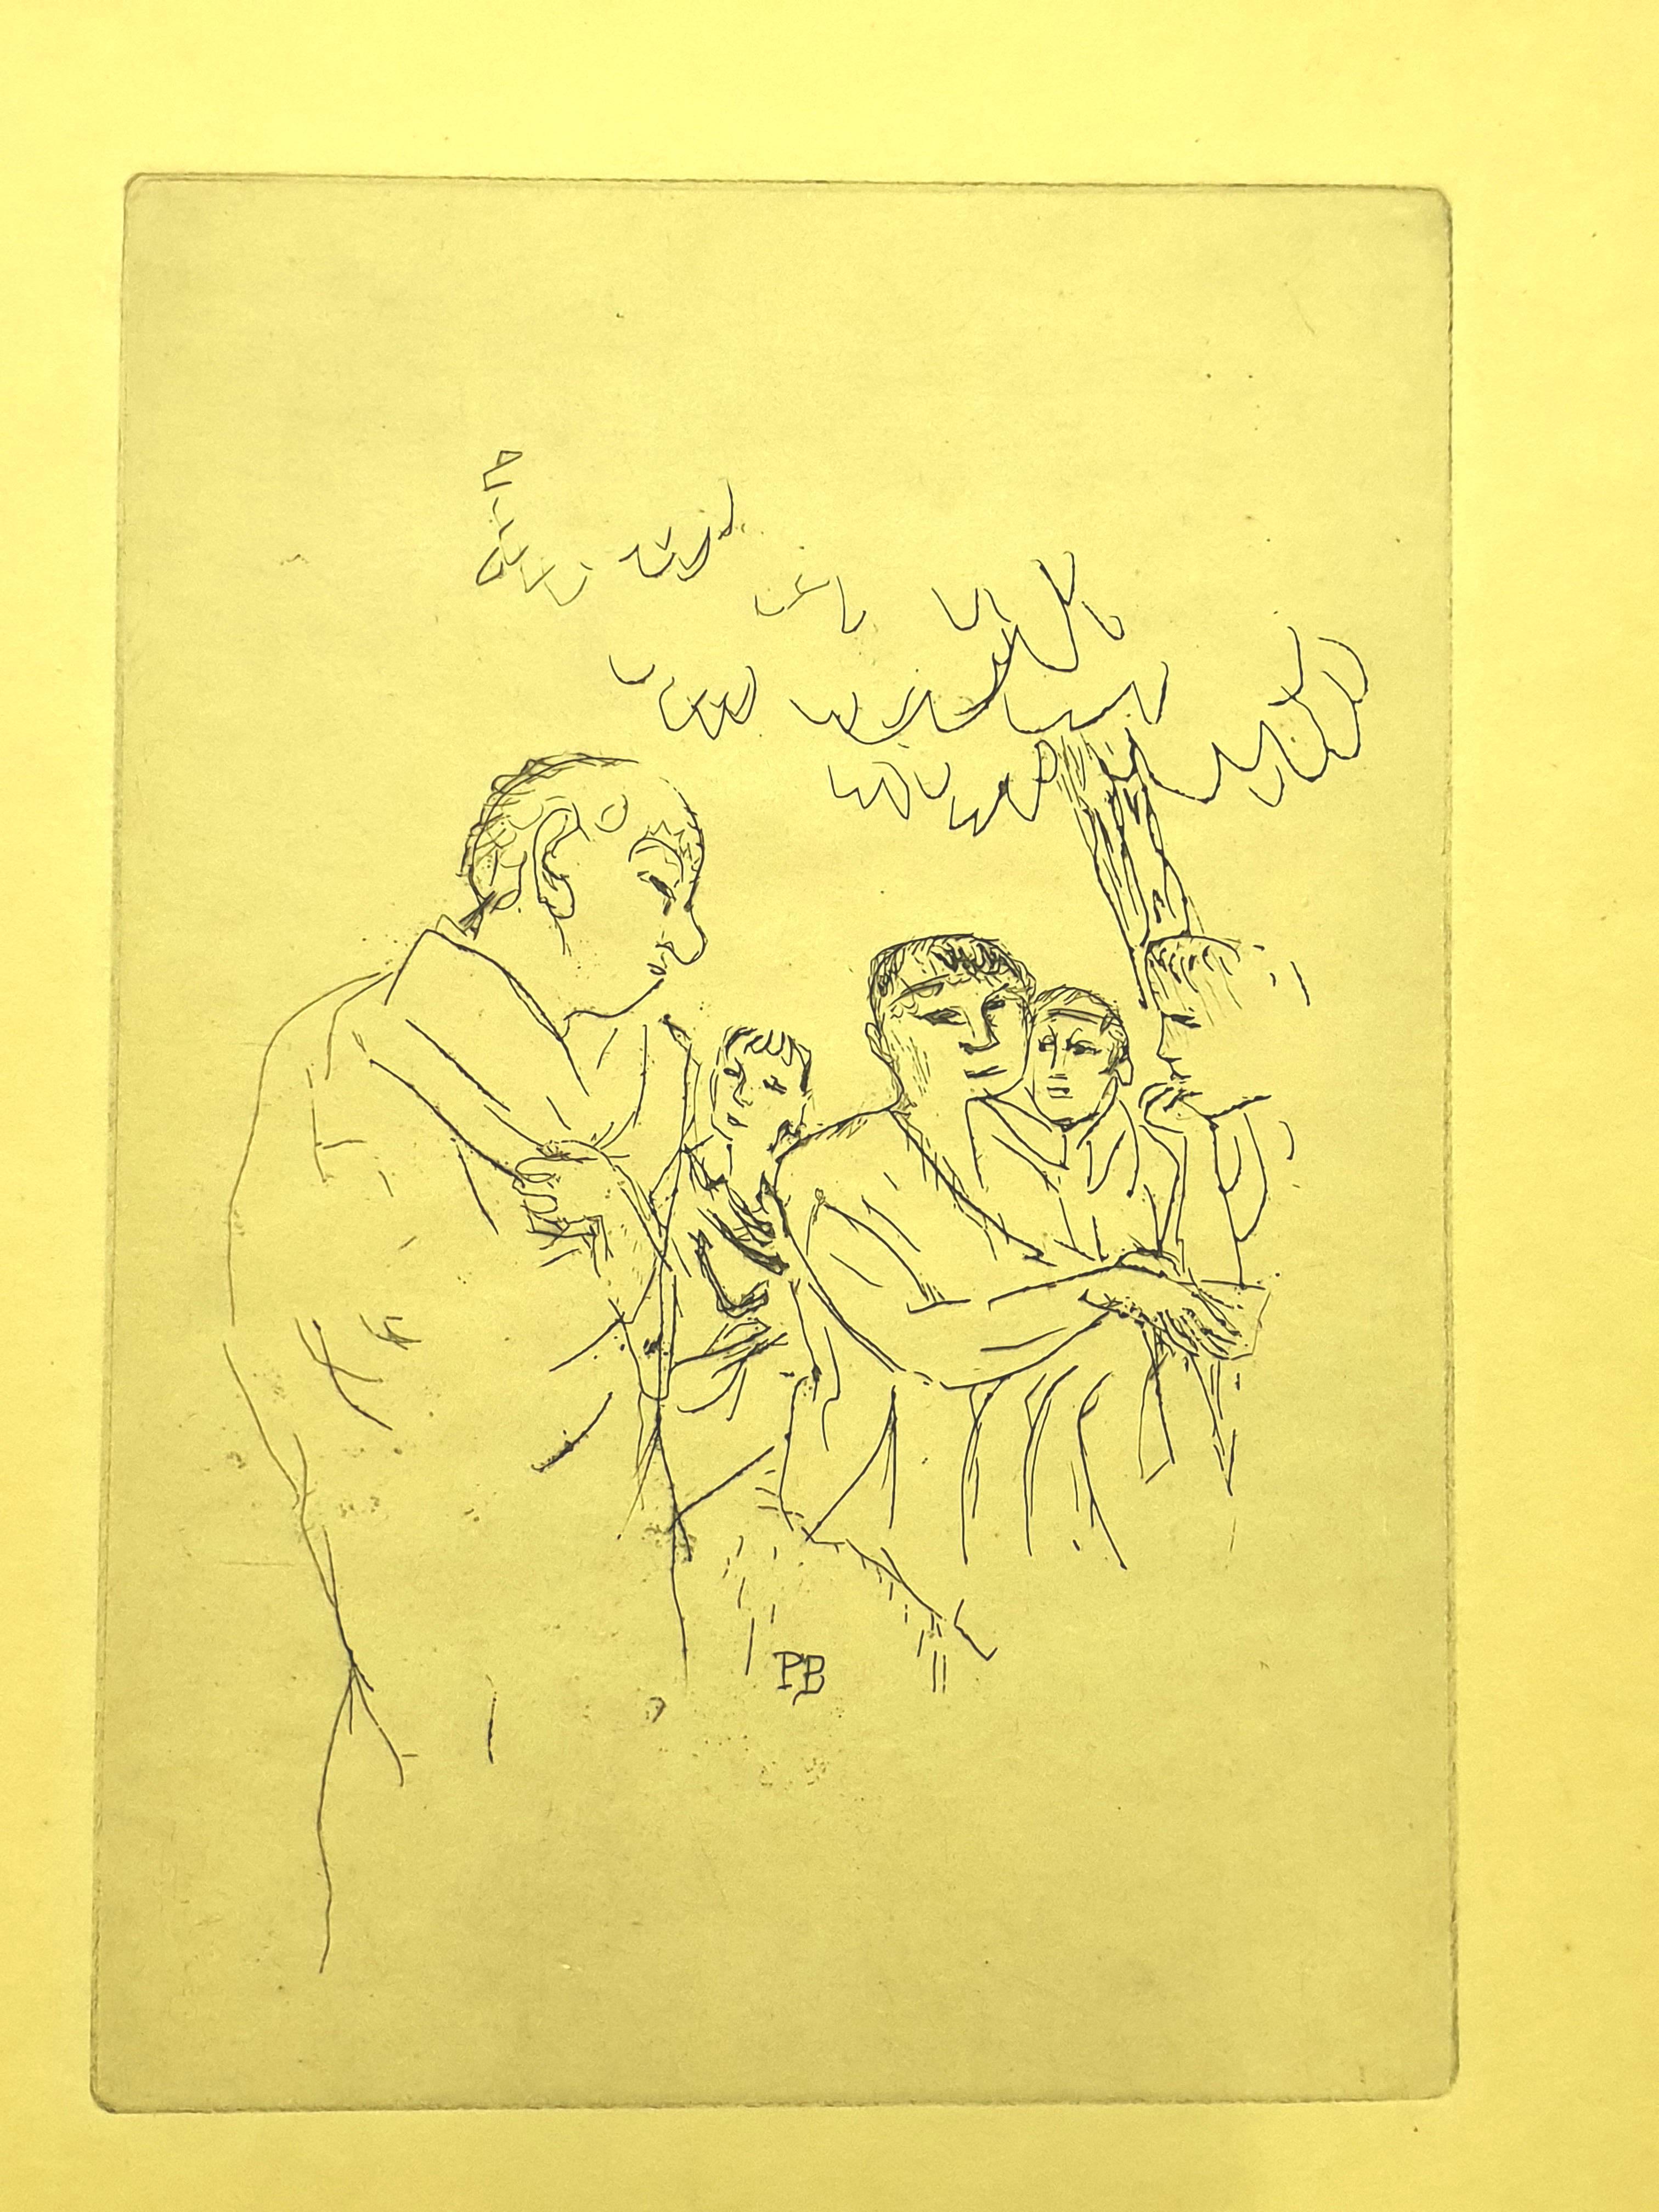 Pierre Bonnard - People - Original Etching